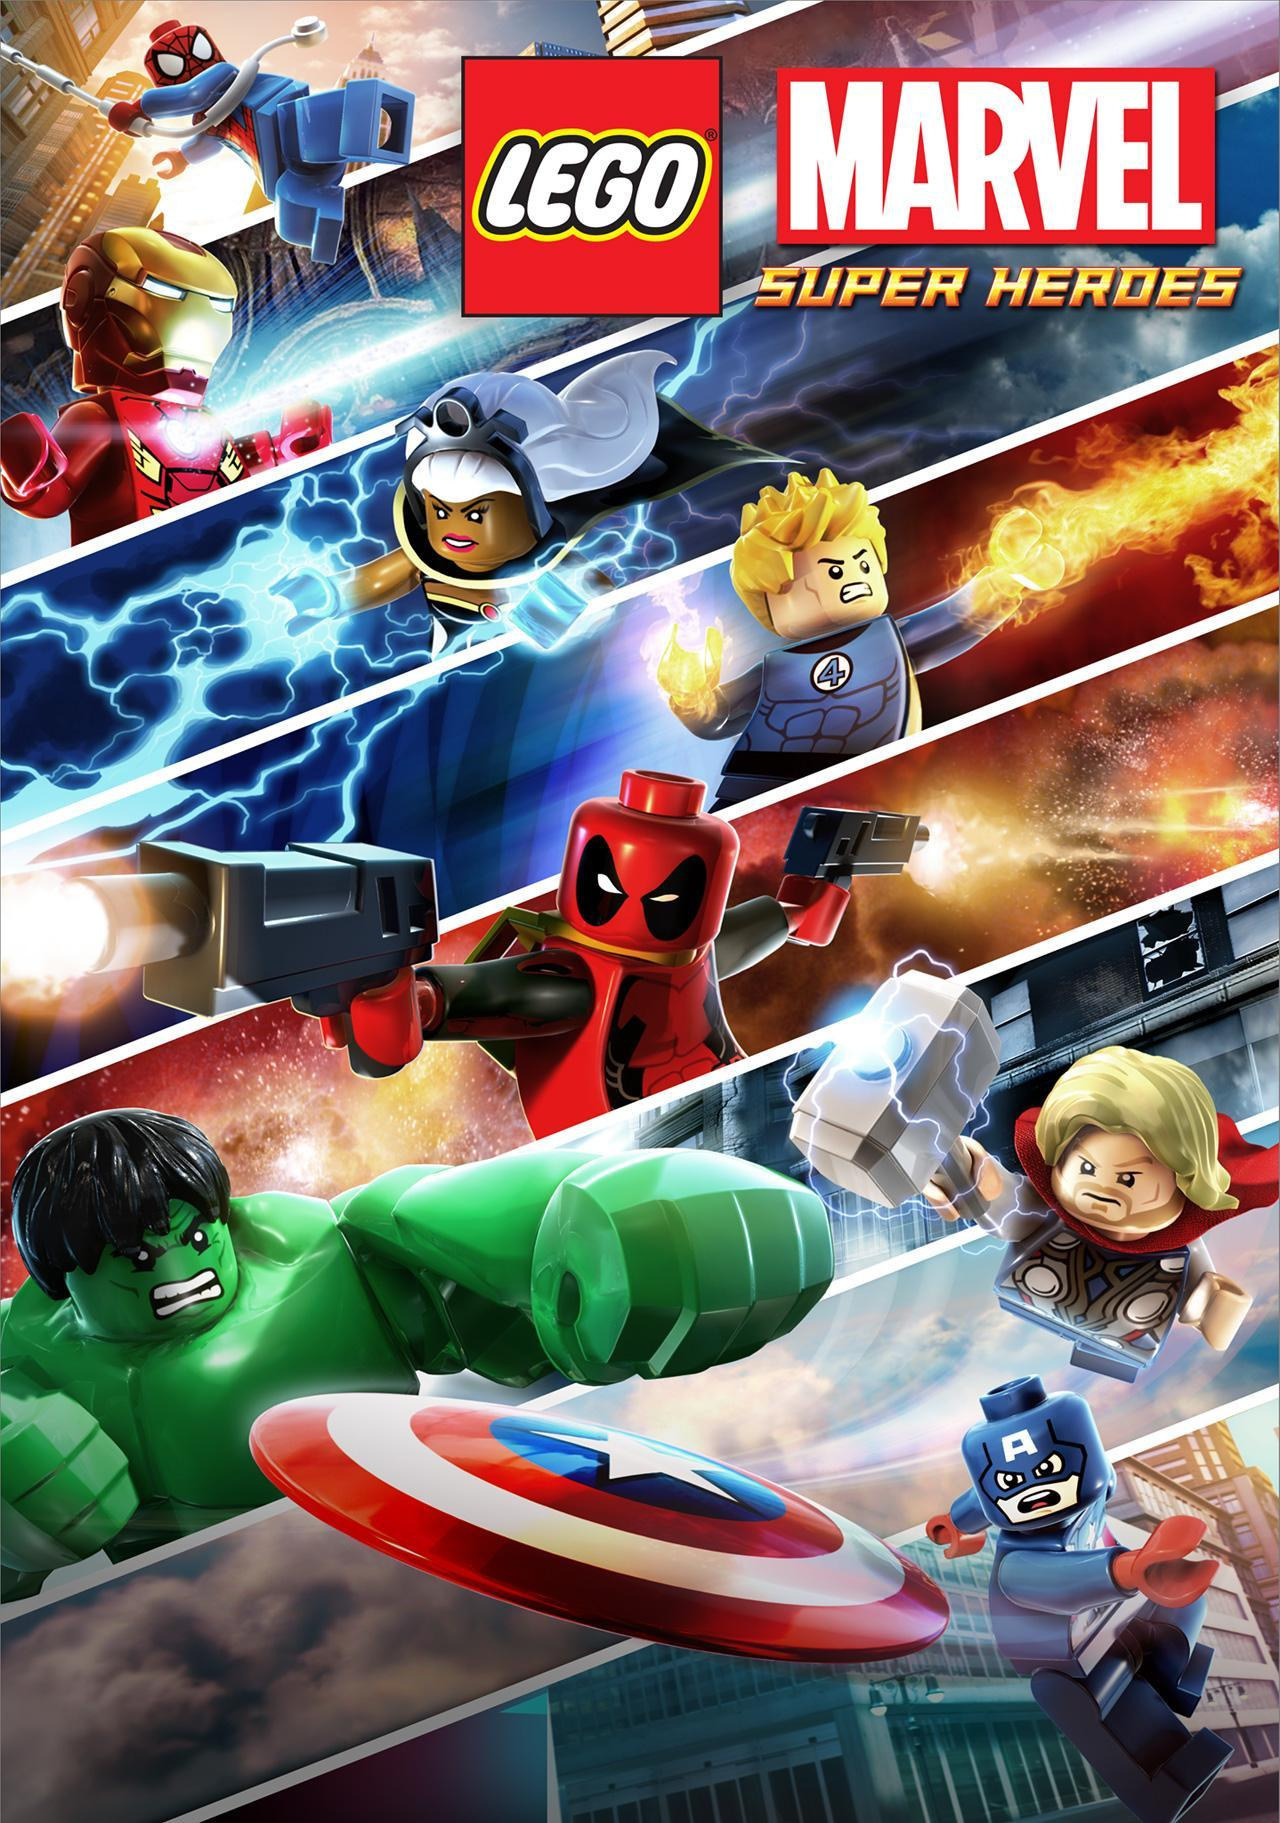 Lego Marvel Superheroes HD Wallpapers - Wallpaper Cave